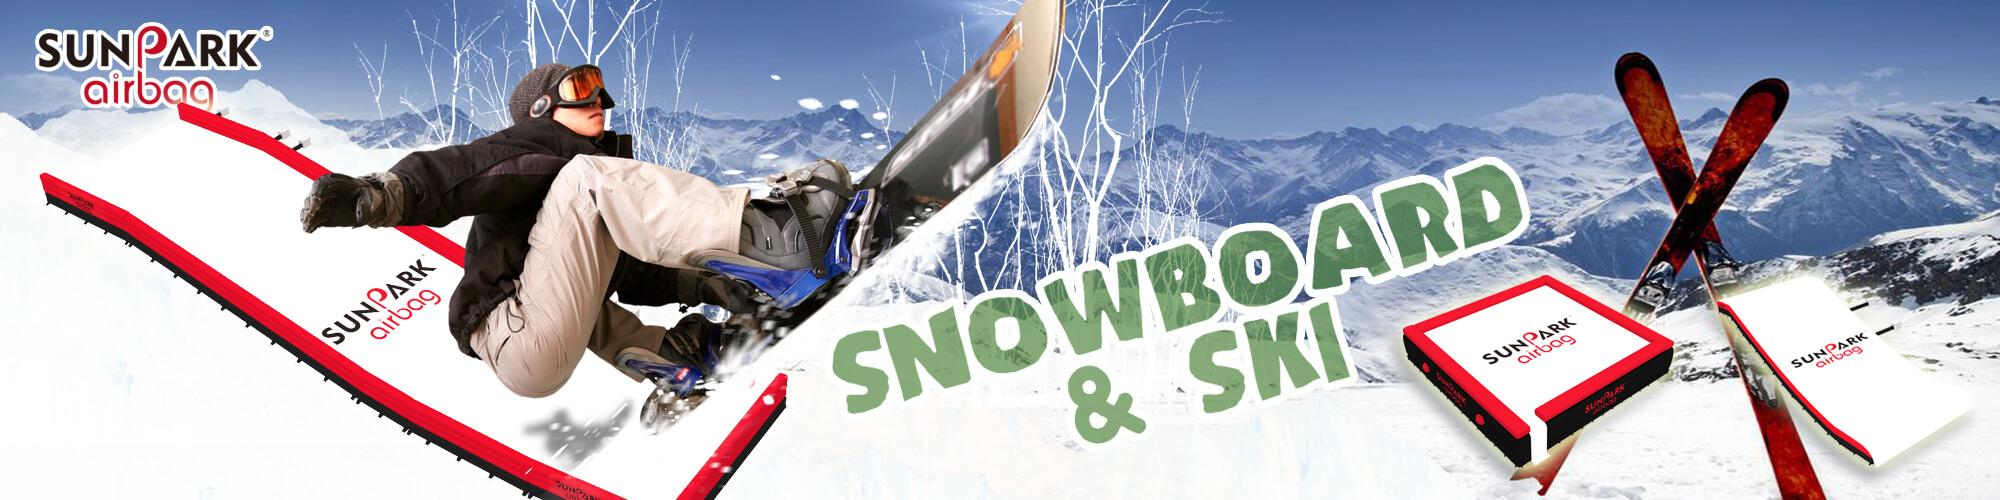 1 Snowboarding Airbag